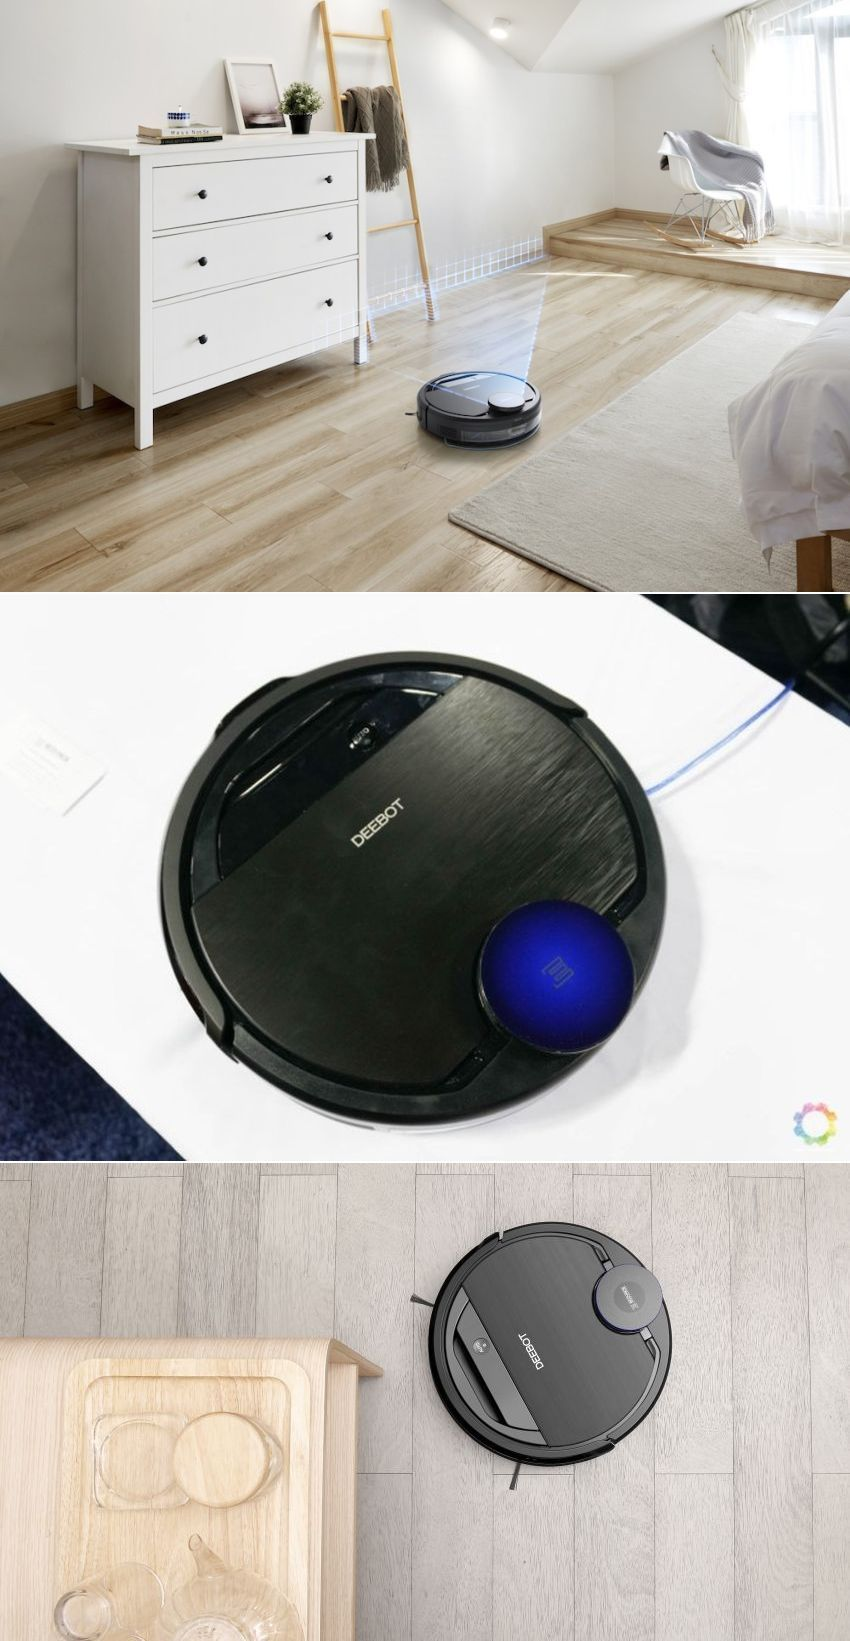 Ecovacs Robotics Brings Smart Floor Cleaning Robot To Ces 2019